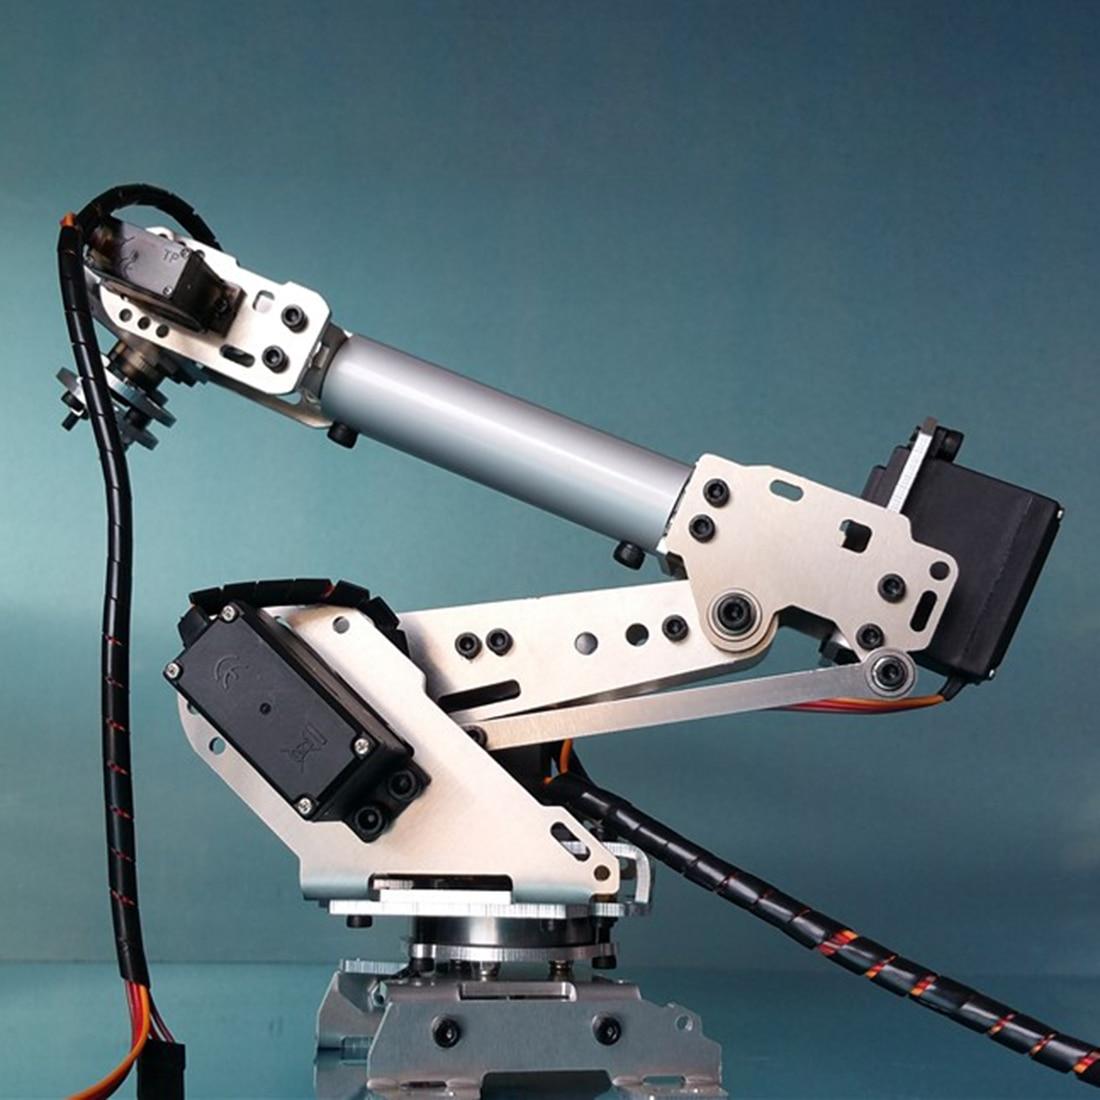 DIY 6DOF Mechanical Arm Robot Kit PS2 Remote Control Robot For Arduino Children Kids Birthdaty Gifts 2020